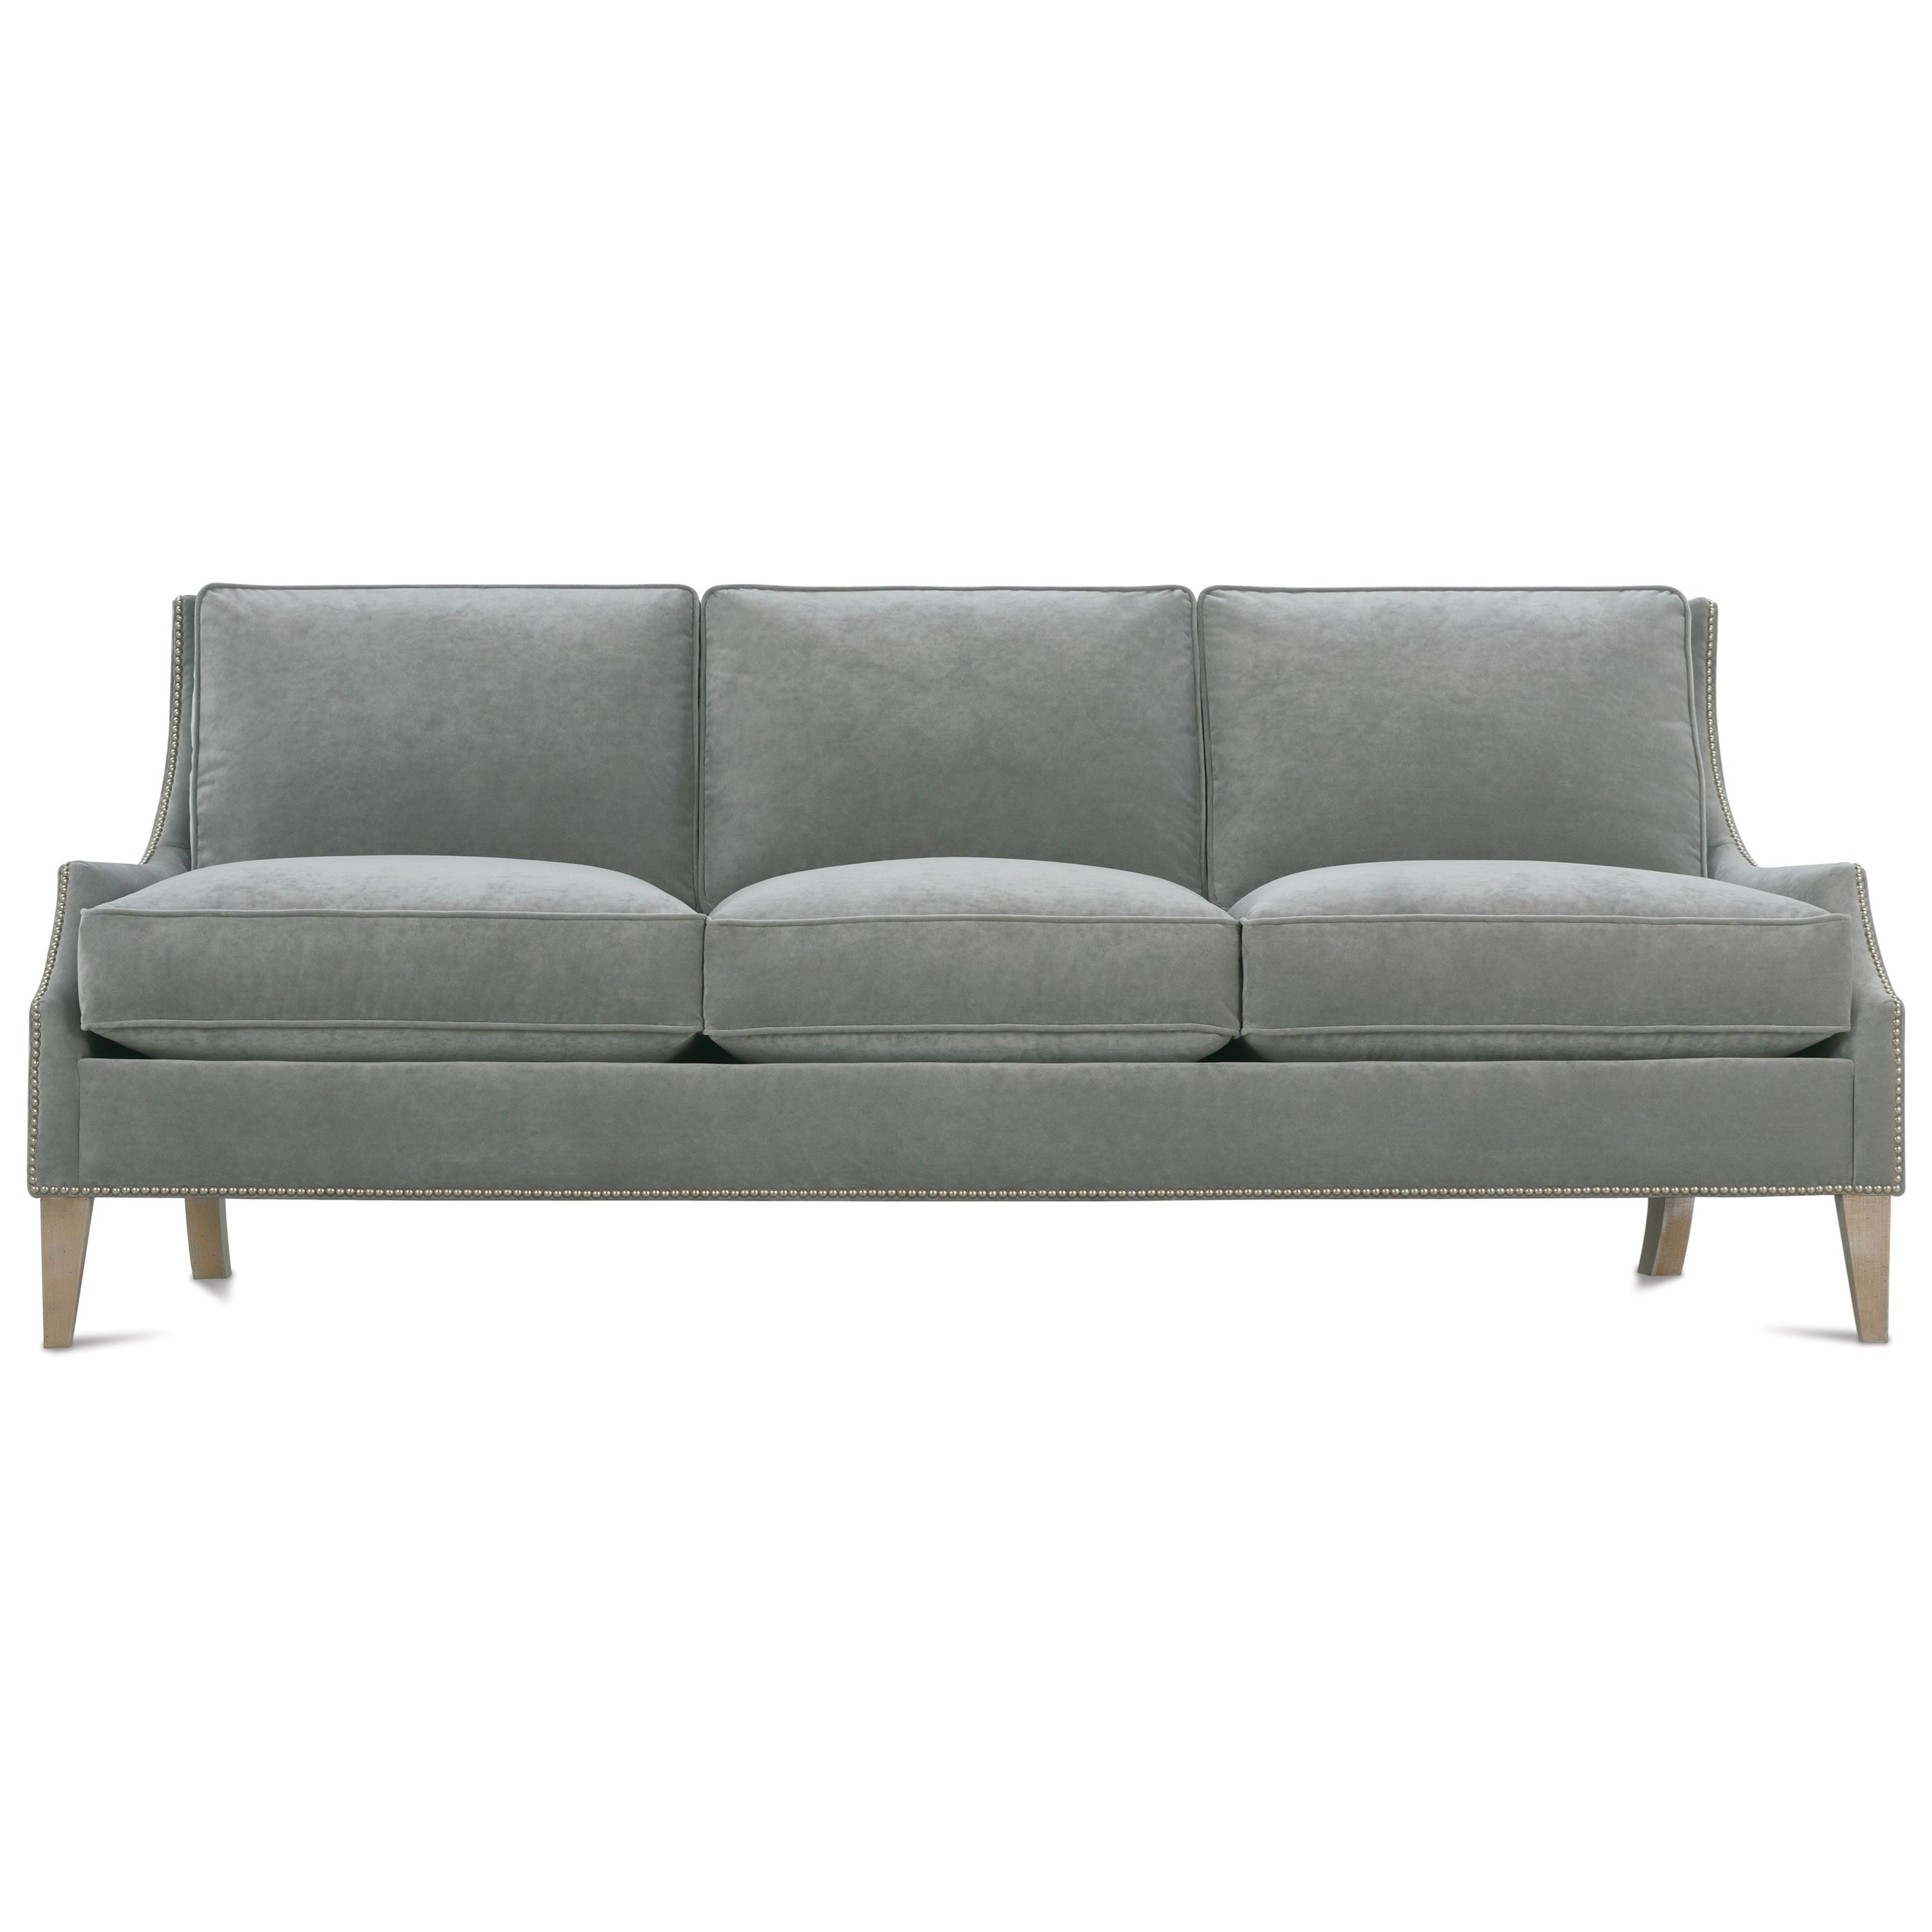 Robin Bruce Duchess Sofa - Item Number: Duchess-002